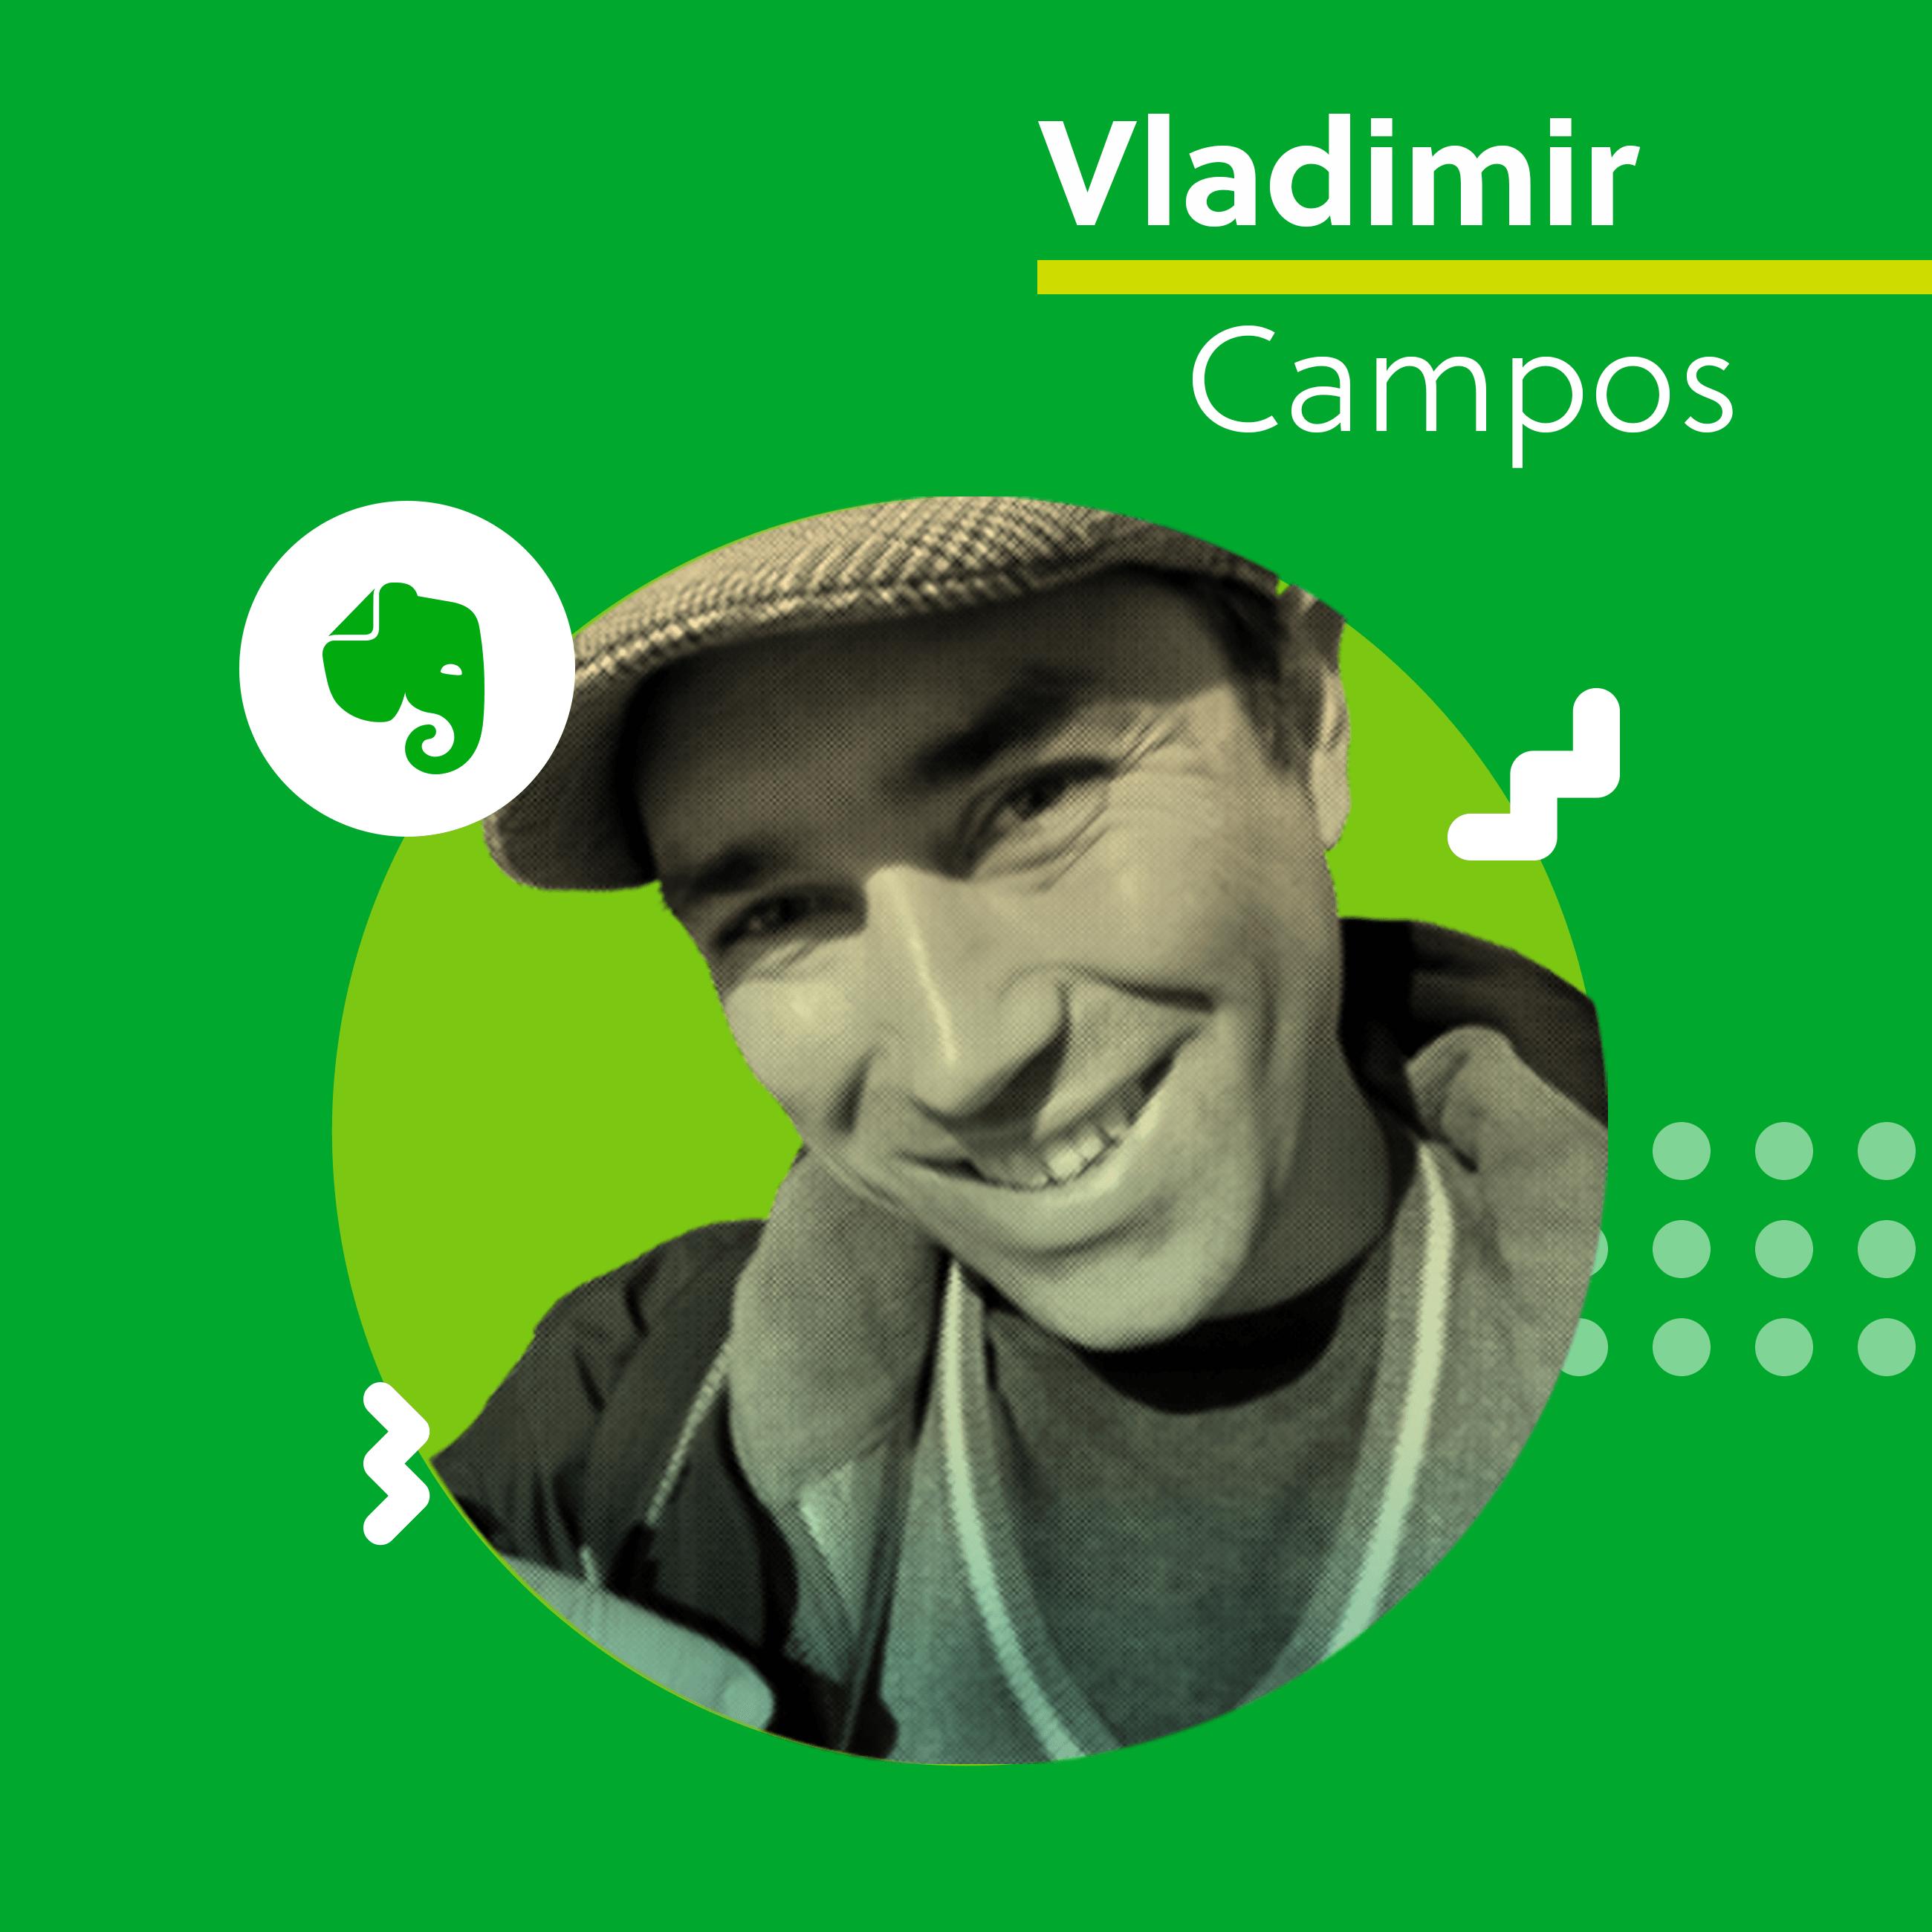 Evernote Certified Consultant Vladimir Campos.